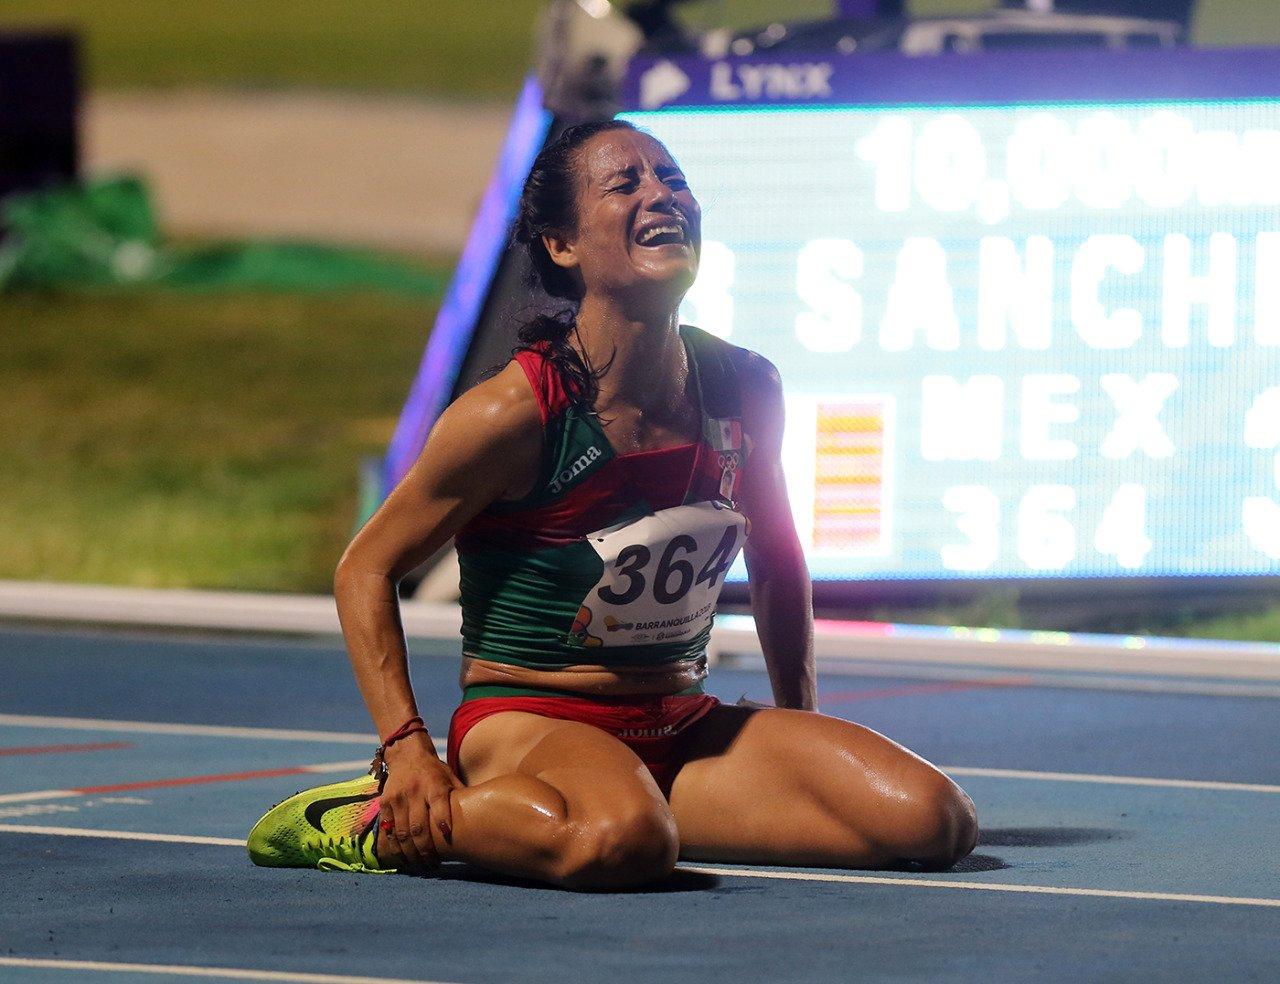 /cms/uploads/image/file/654196/_rsula_S_nchez_maratonista_mexicana_2.jpg